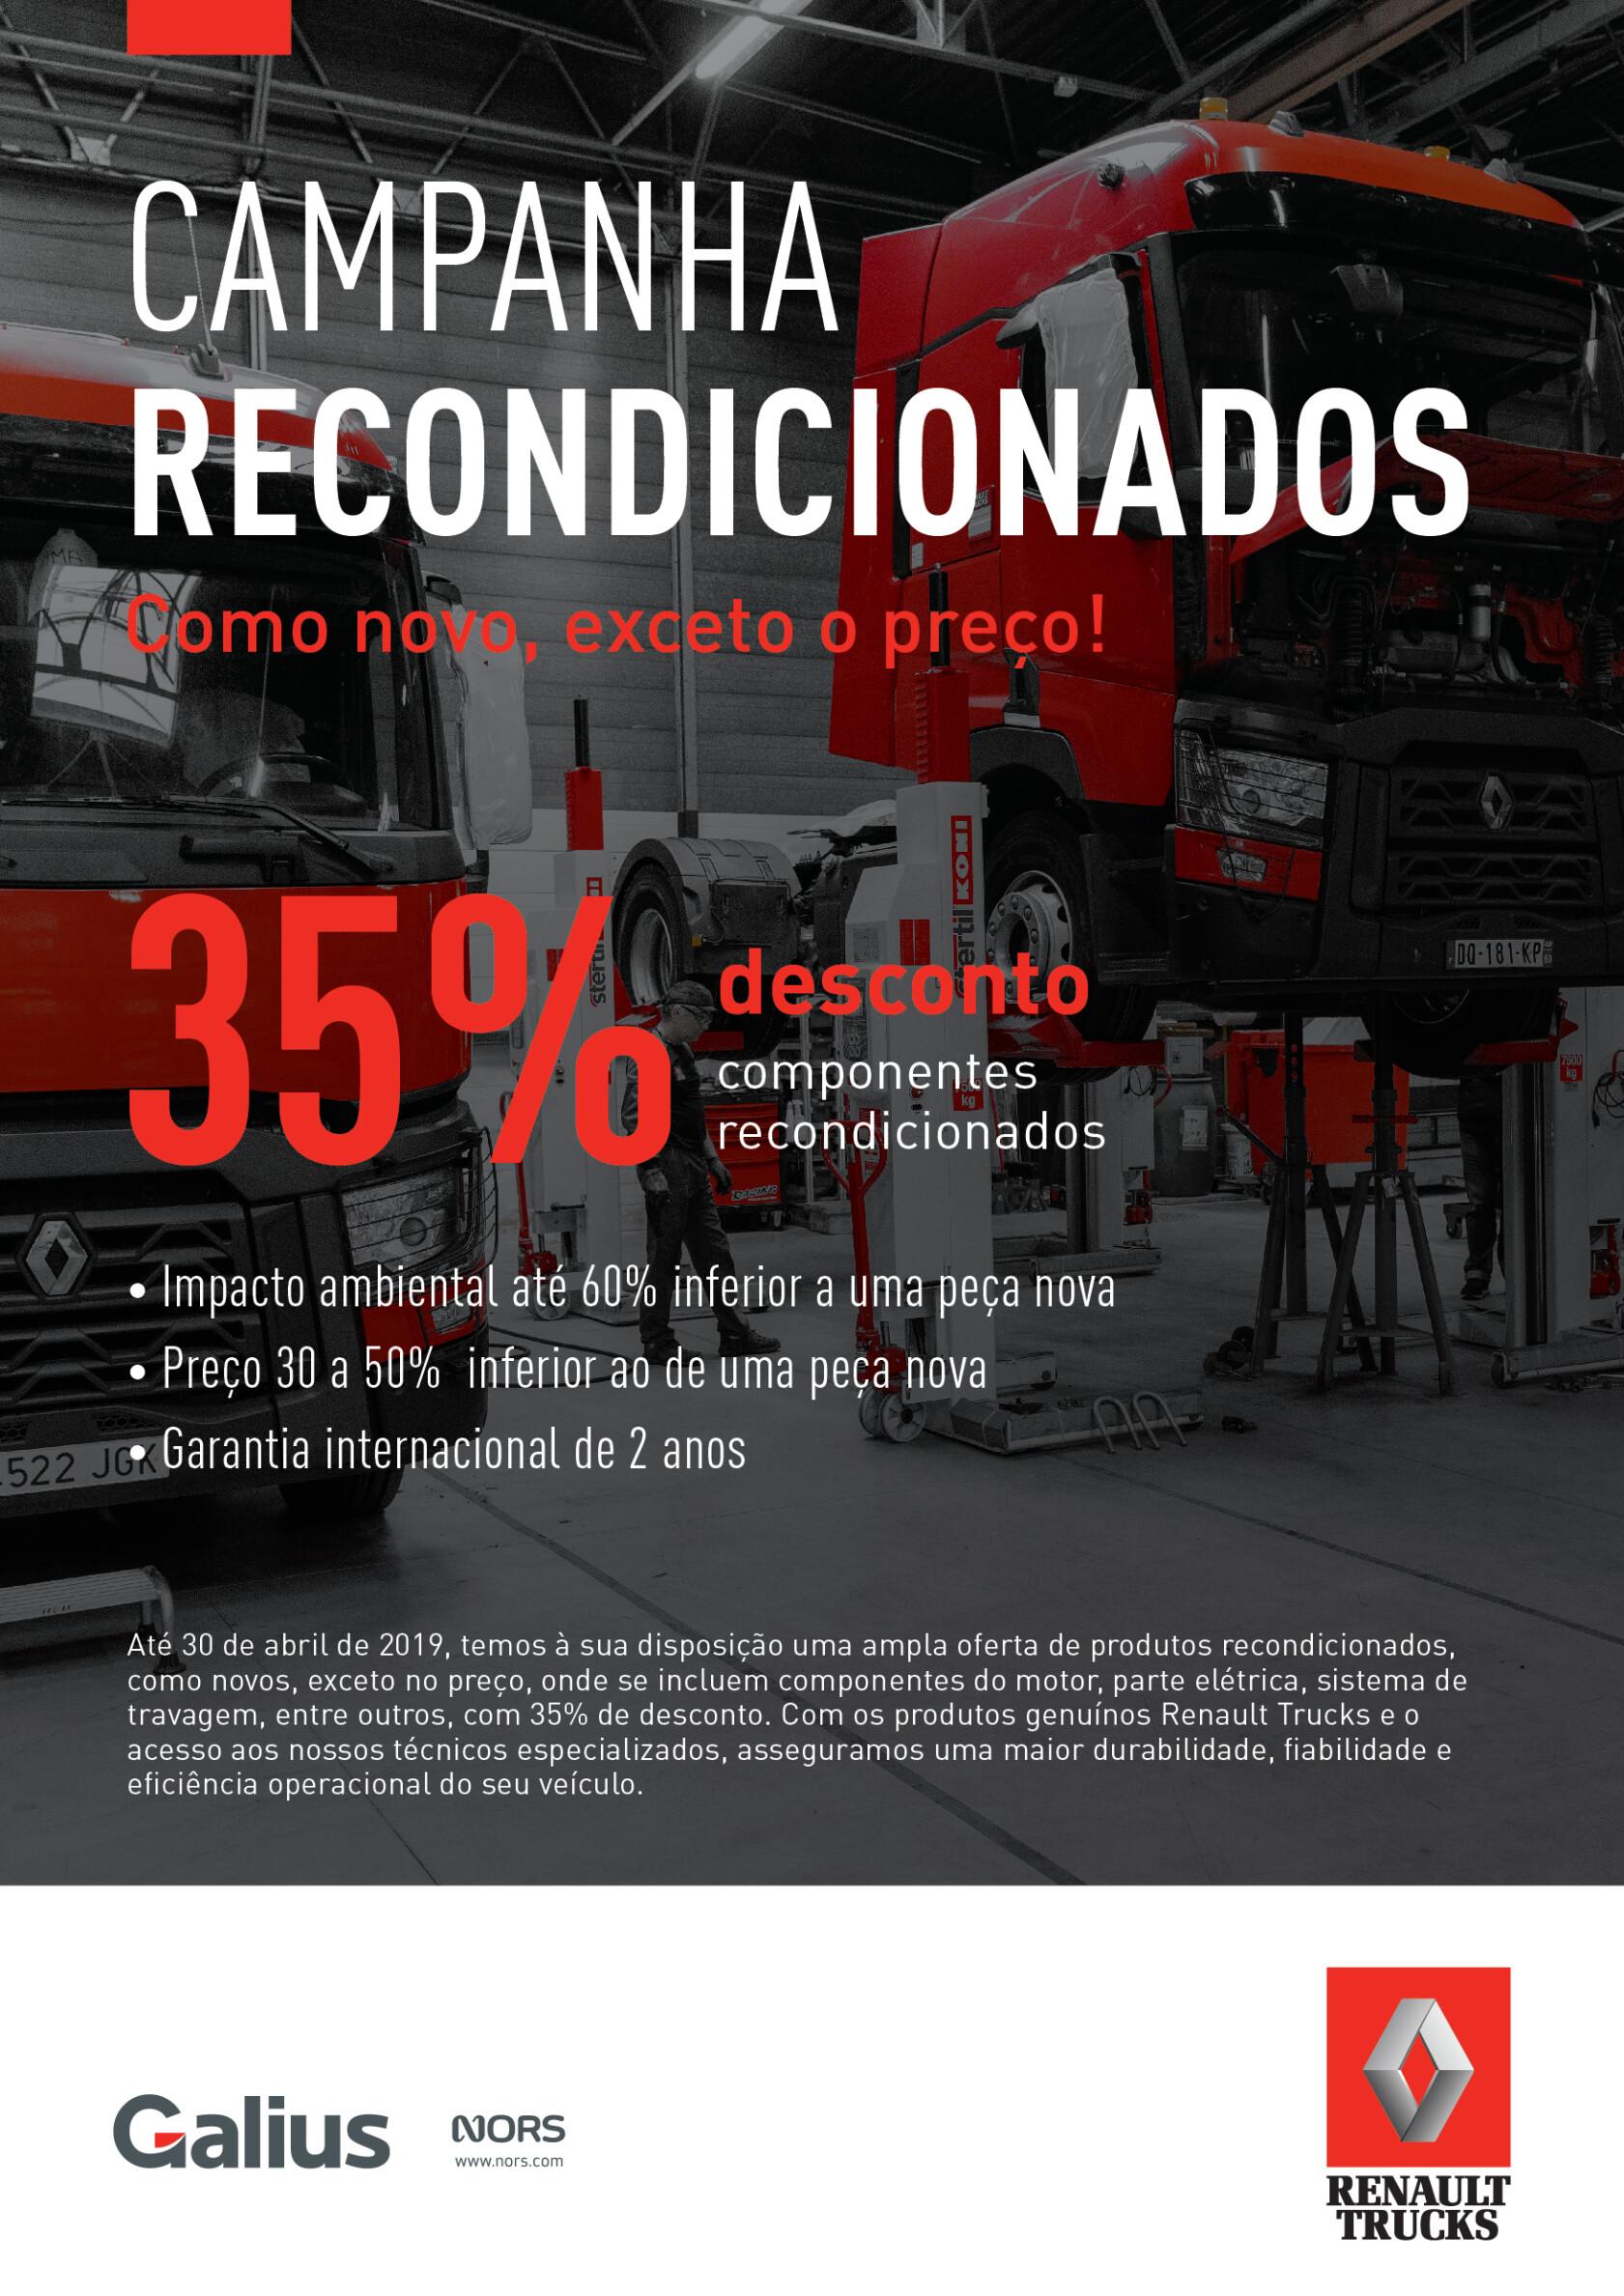 Campanha recondicionados-01